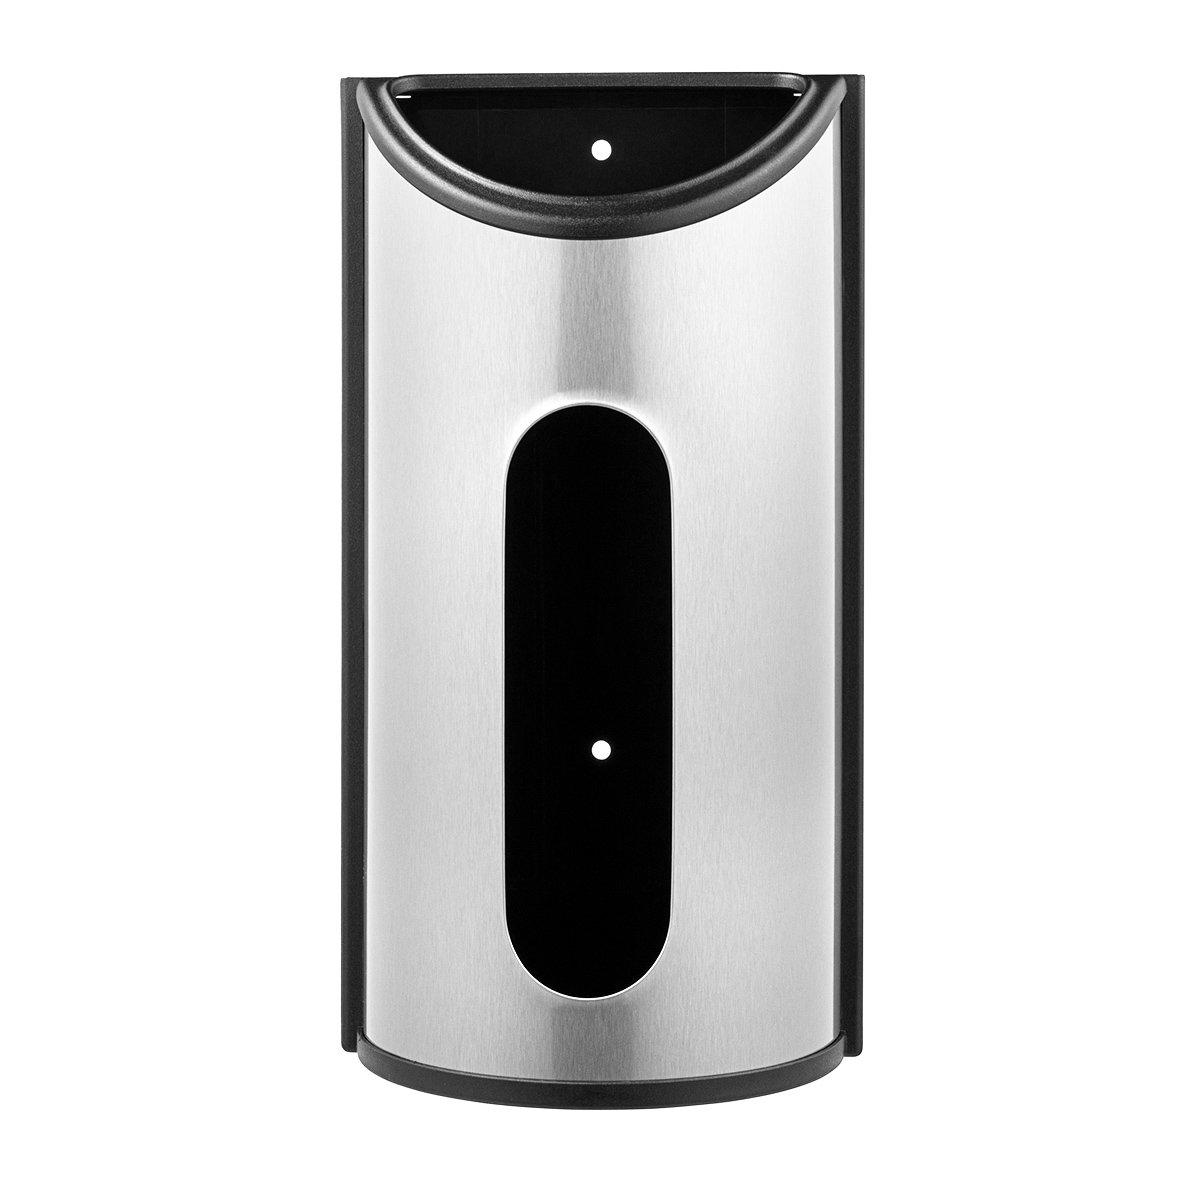 Deppon Stainless Steel Trash Garbage Grocery Bags Organizer Dispenser Saver Holder for Kitchen Lavatory Bathroom